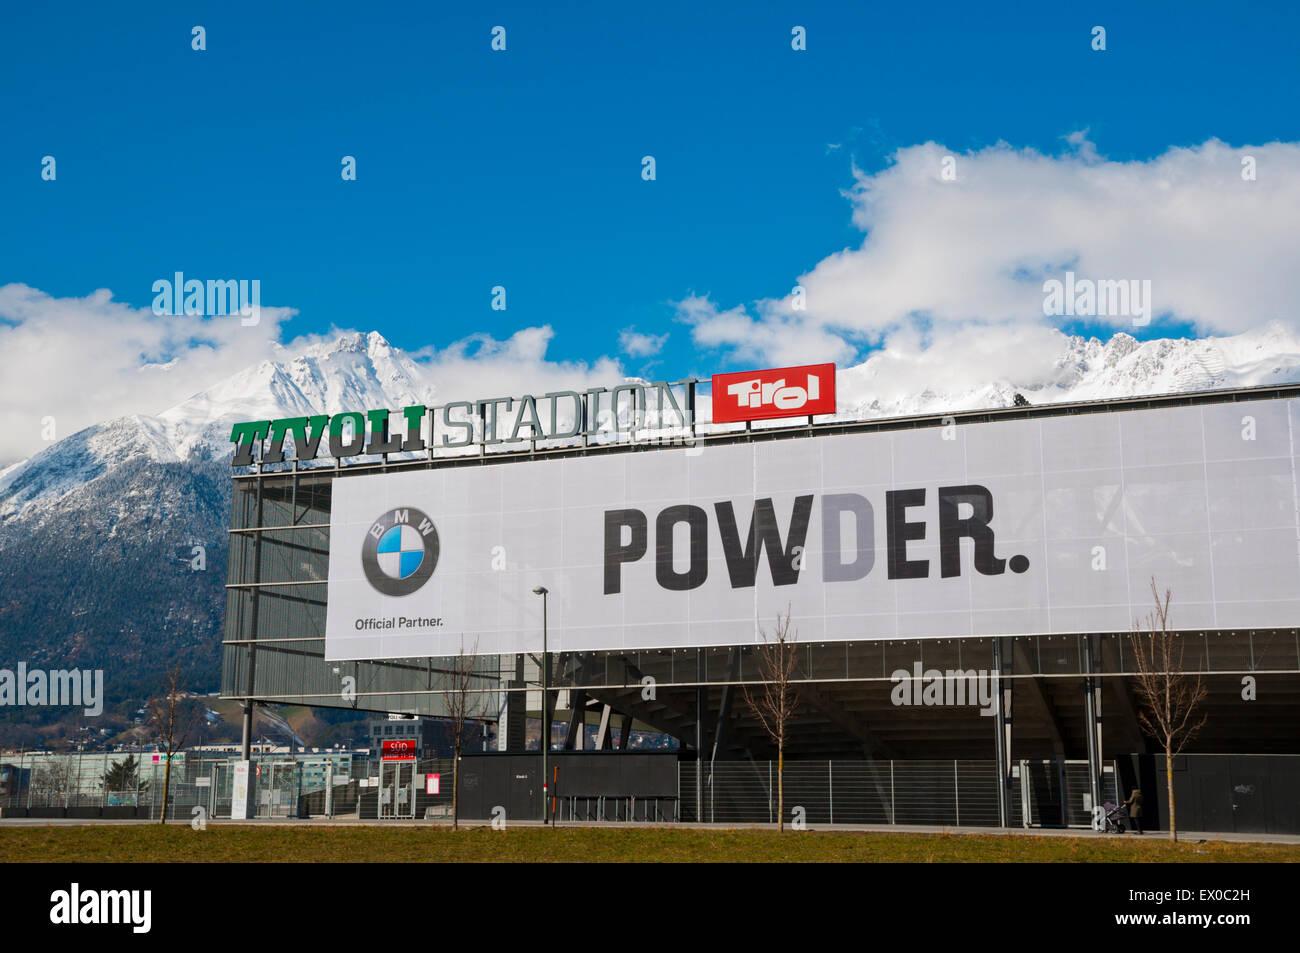 Tivoli Stadion, Amras, Innsbruck, Inn Valley, Tyrol, Austria - Stock Image